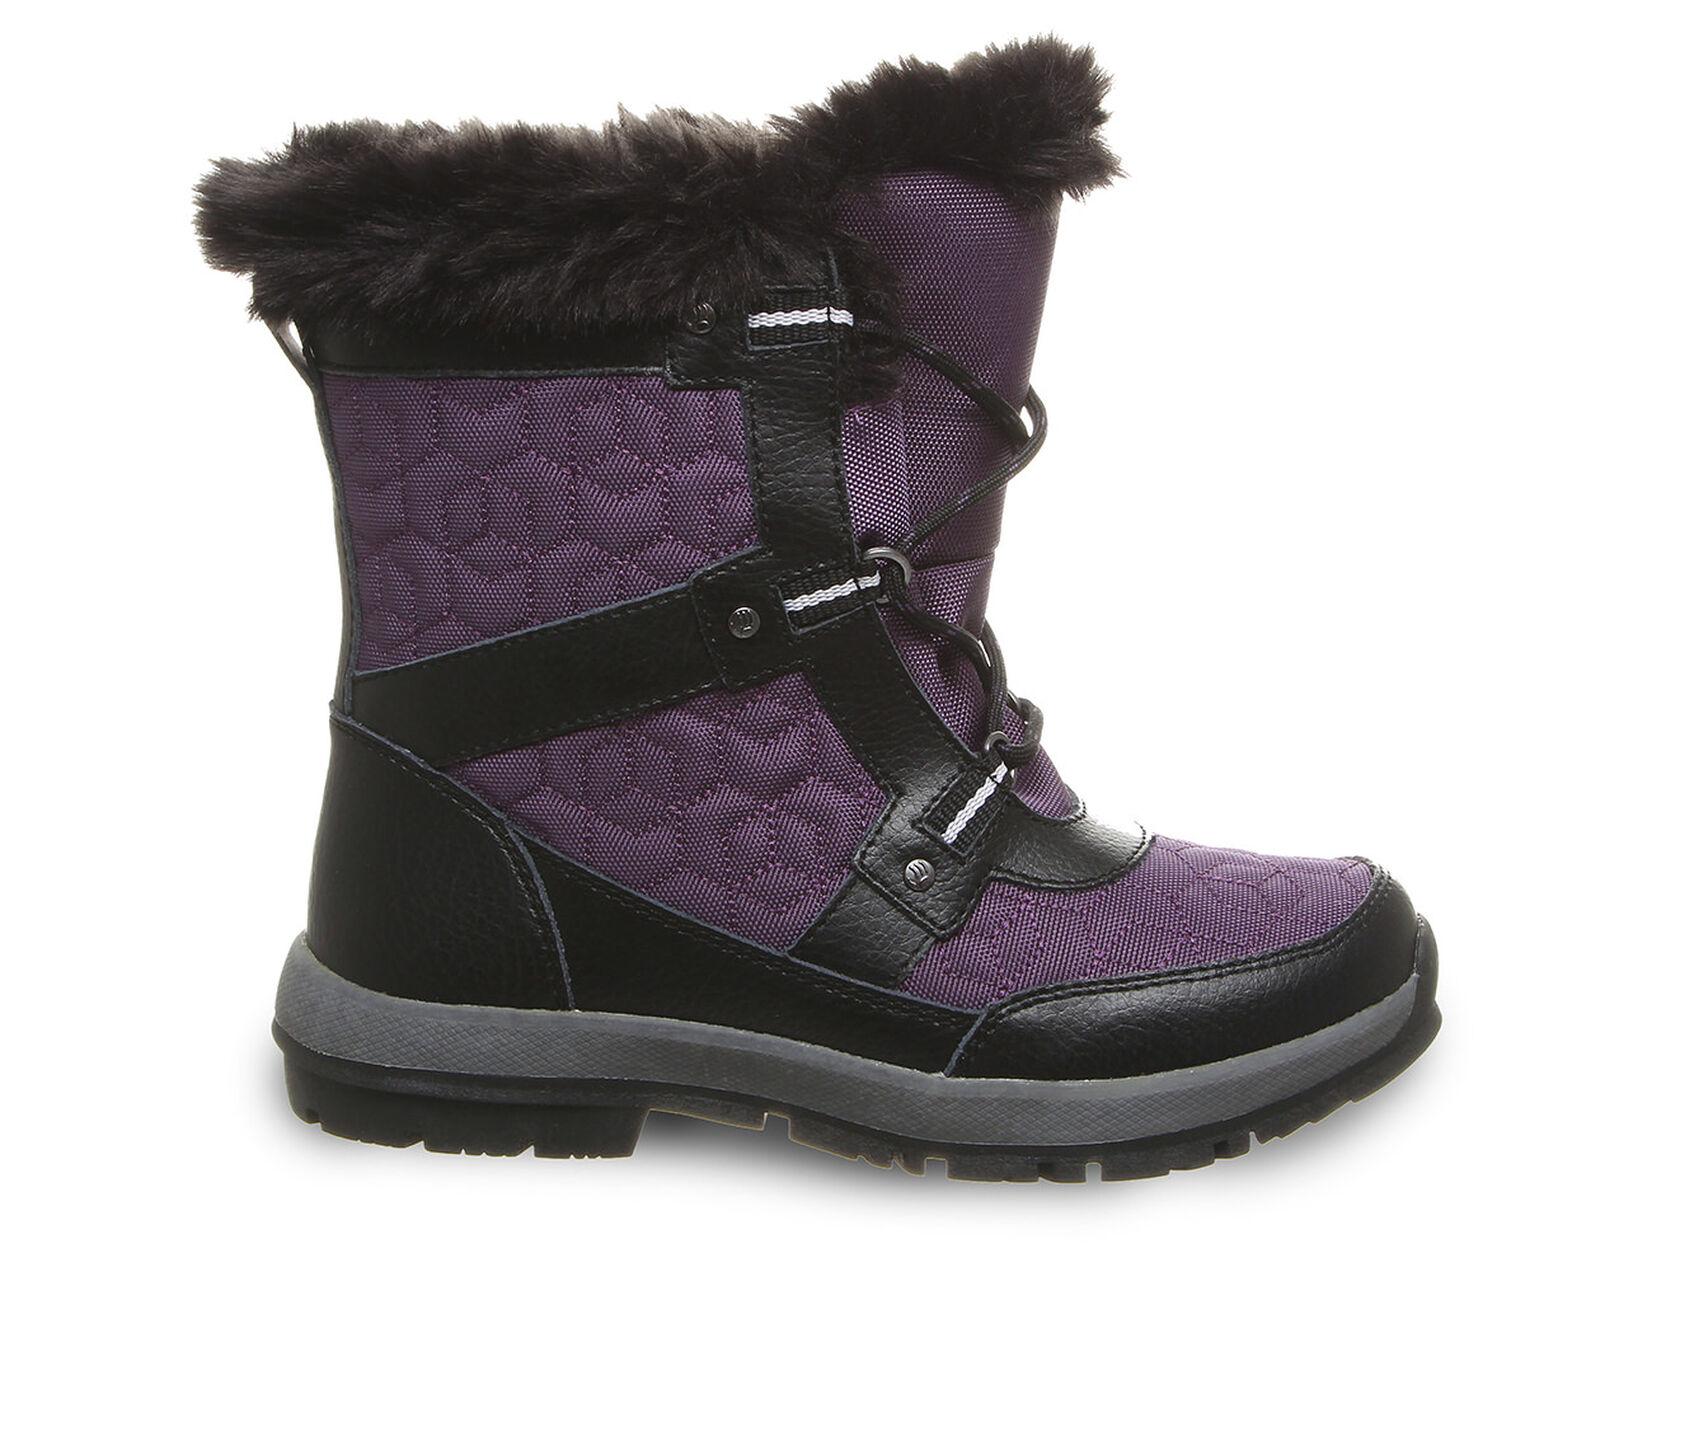 87ea6e4752f1 Women  39 s Bearpaw Marina Winter Boots. Previous